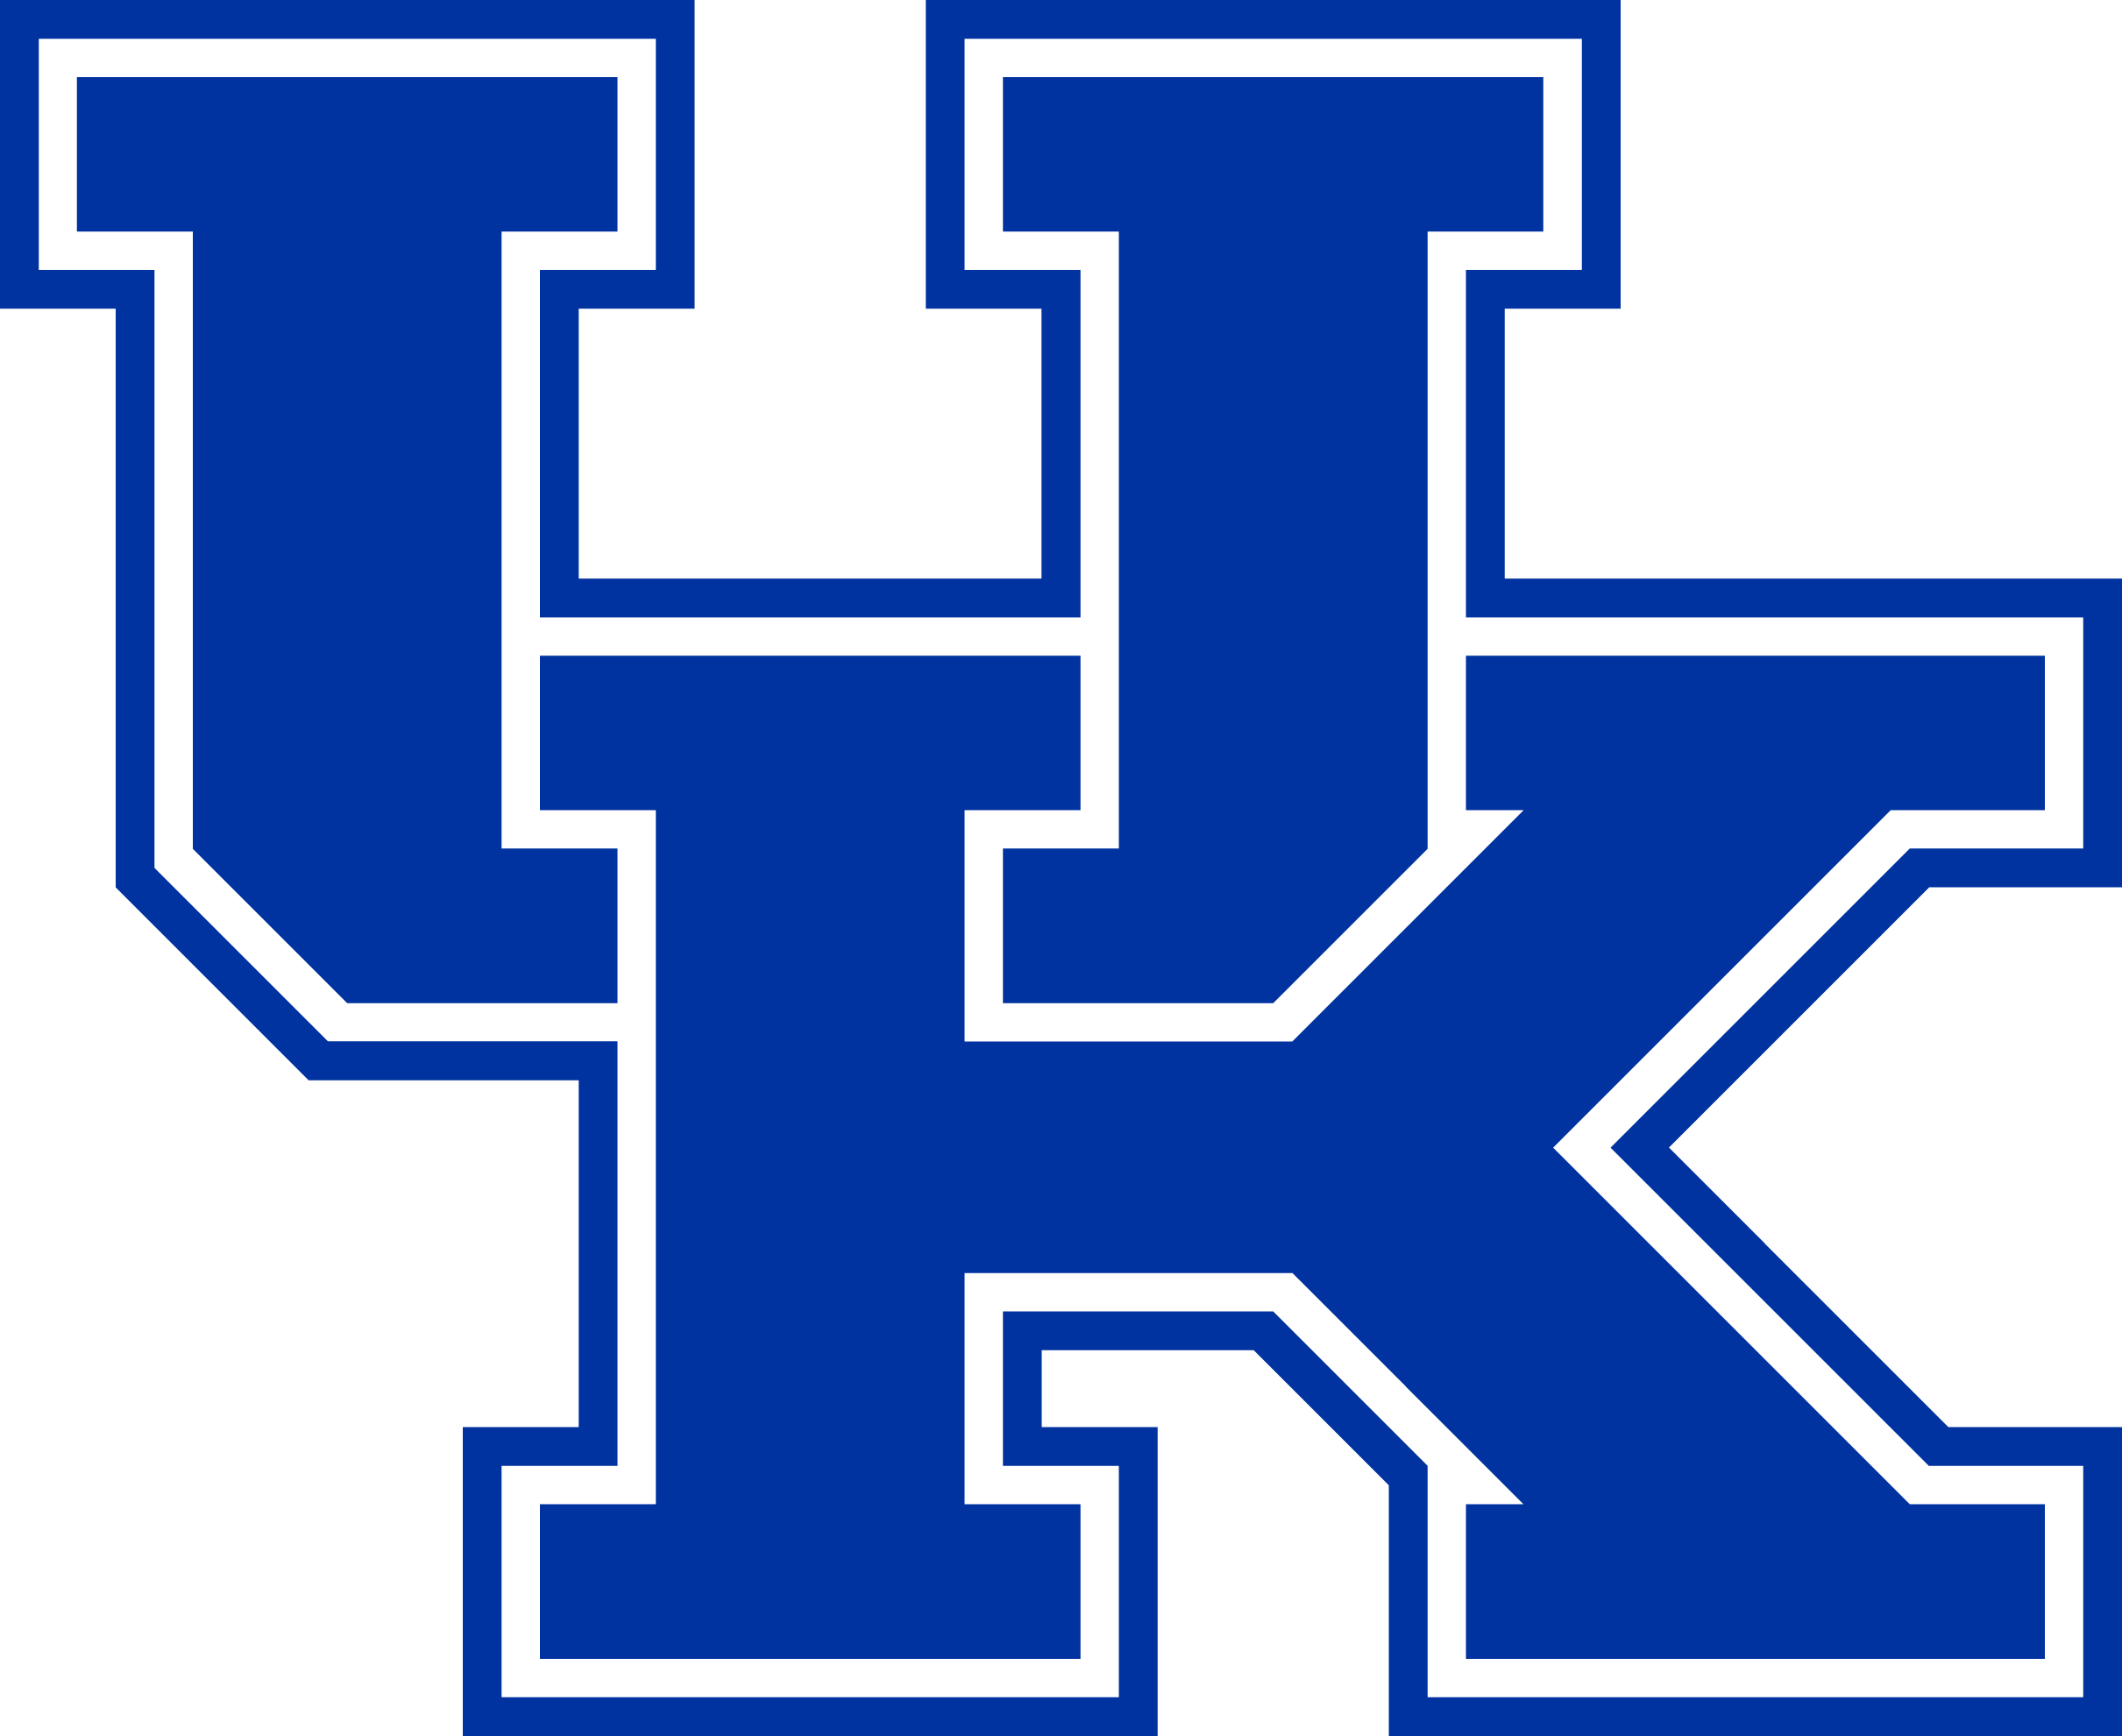 Uk basketball clipart graphic free stock UK Logo – University of Kentucky   Logos   Pinterest   Logos and ... graphic free stock